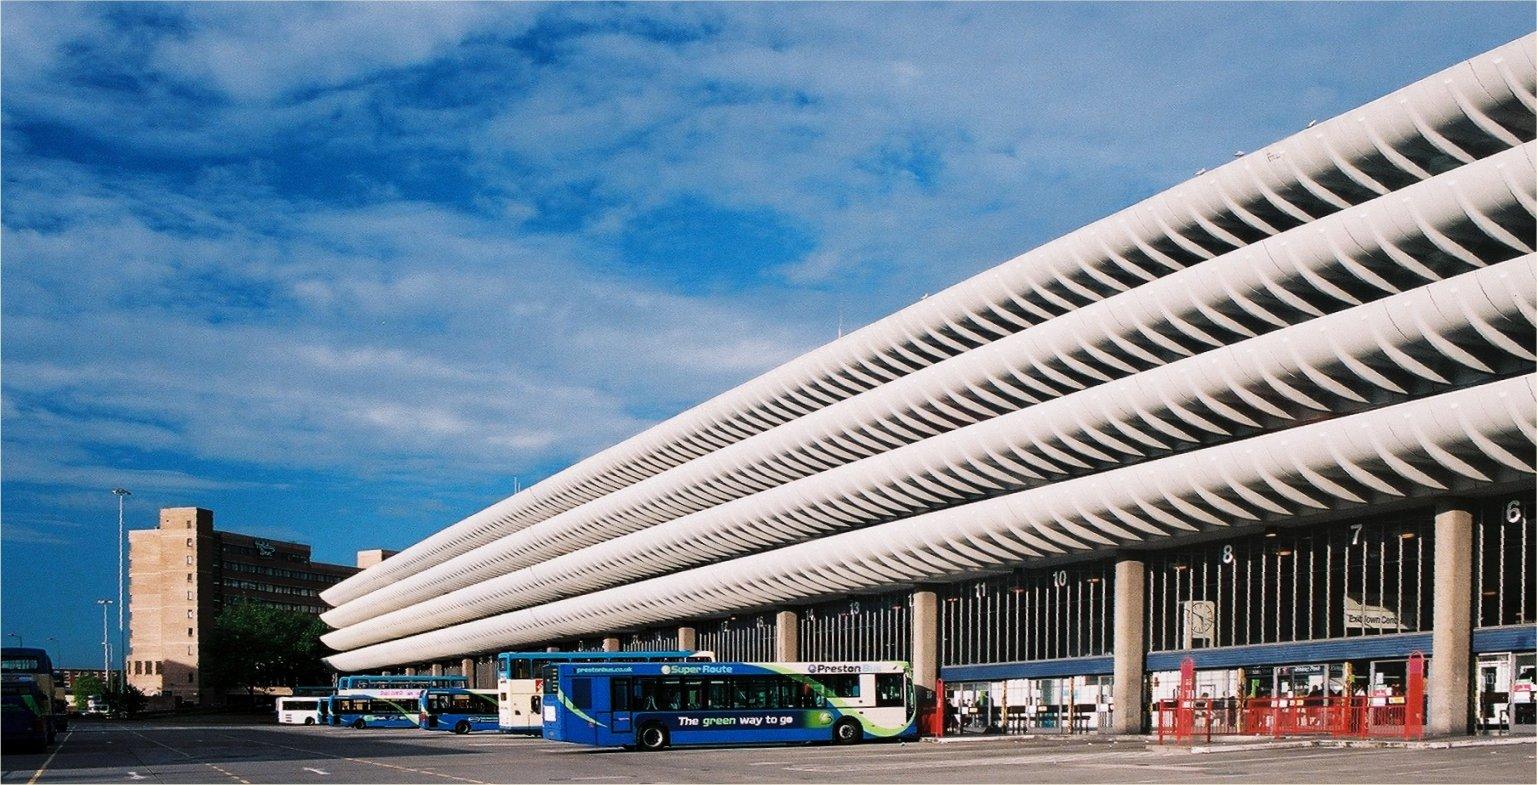 Preston Bus Station (Lancashire, Inglaterra). Building Design Partnership